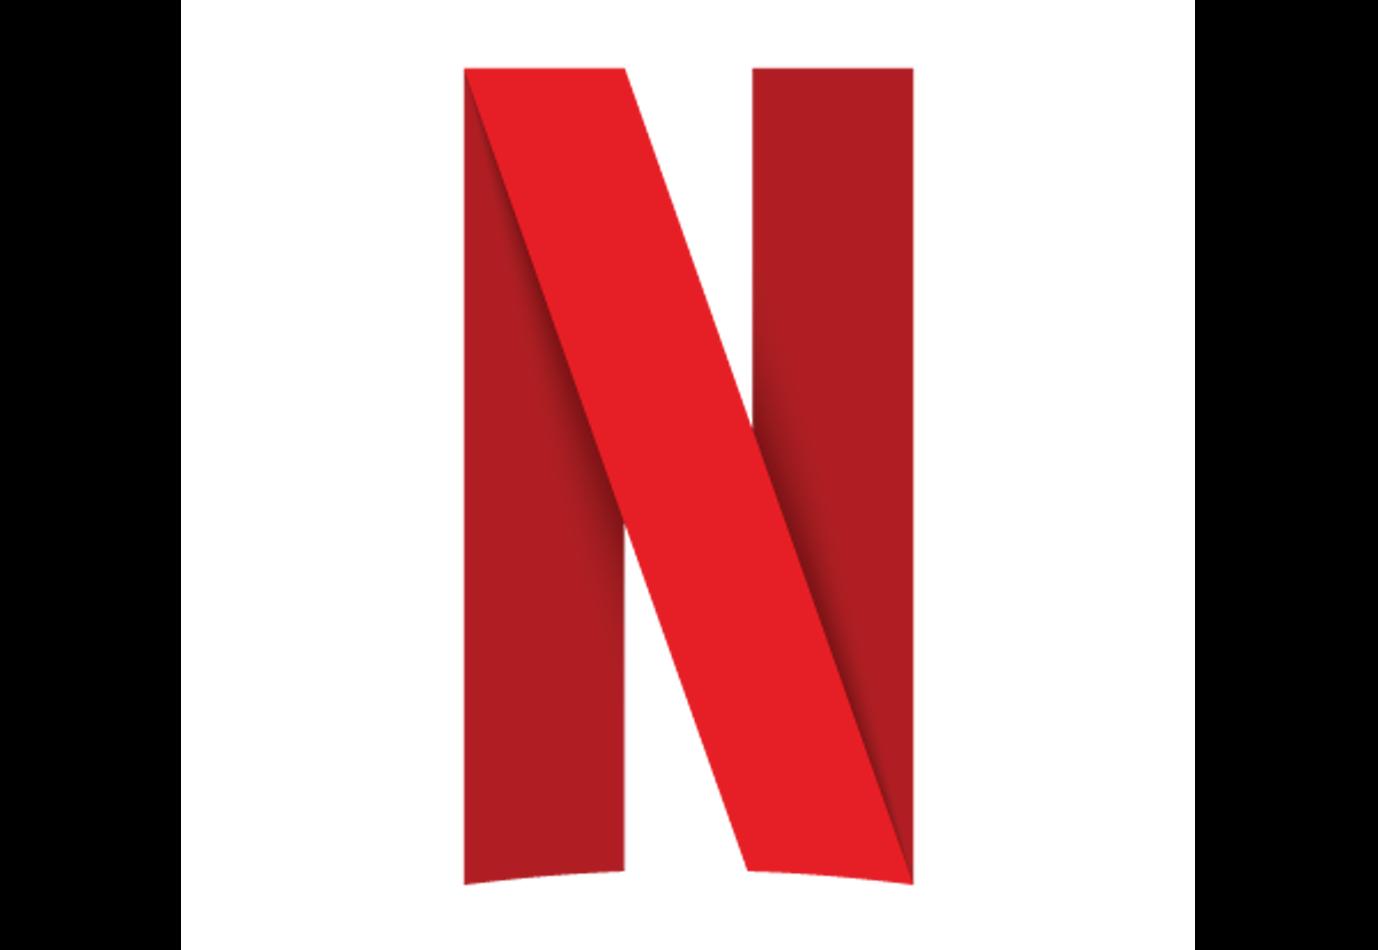 crop-689-475-1378-950-0-Netflix_N_logo.png